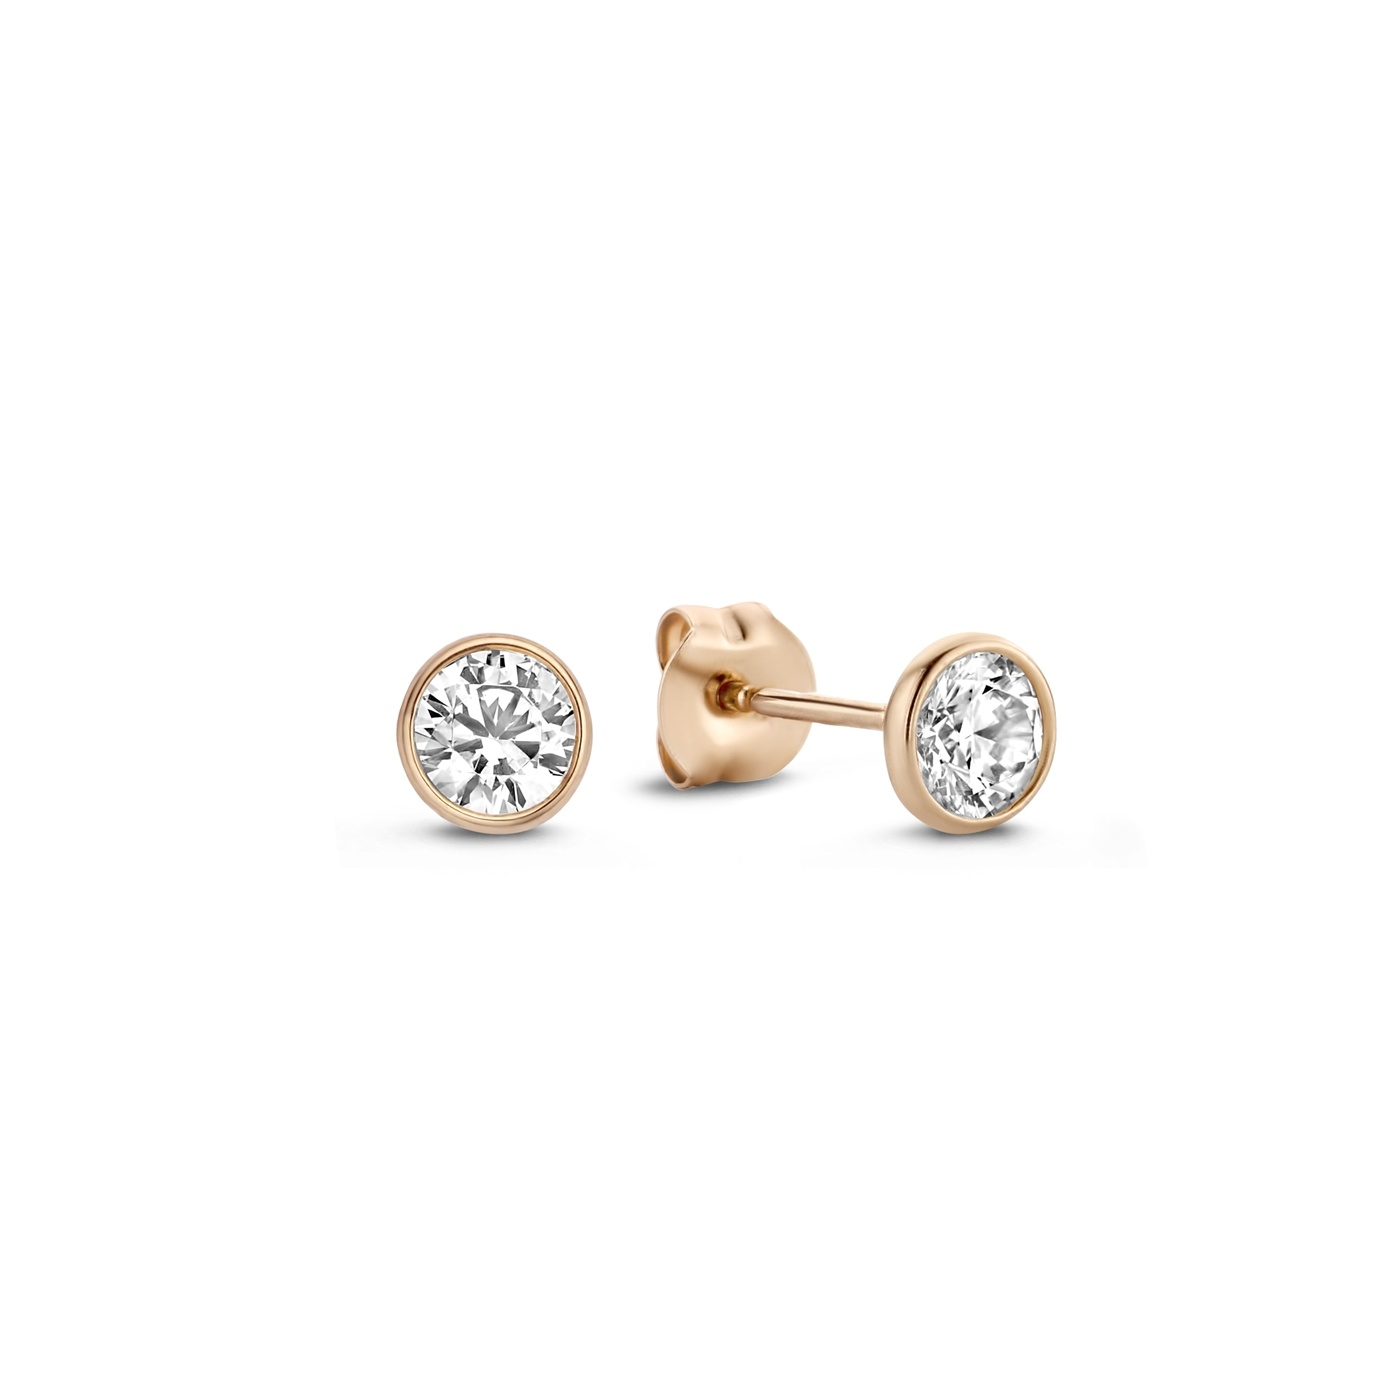 Isabel Bernard La Concorde Loane 14 karaat rosé gouden oorknoppen zirkonia